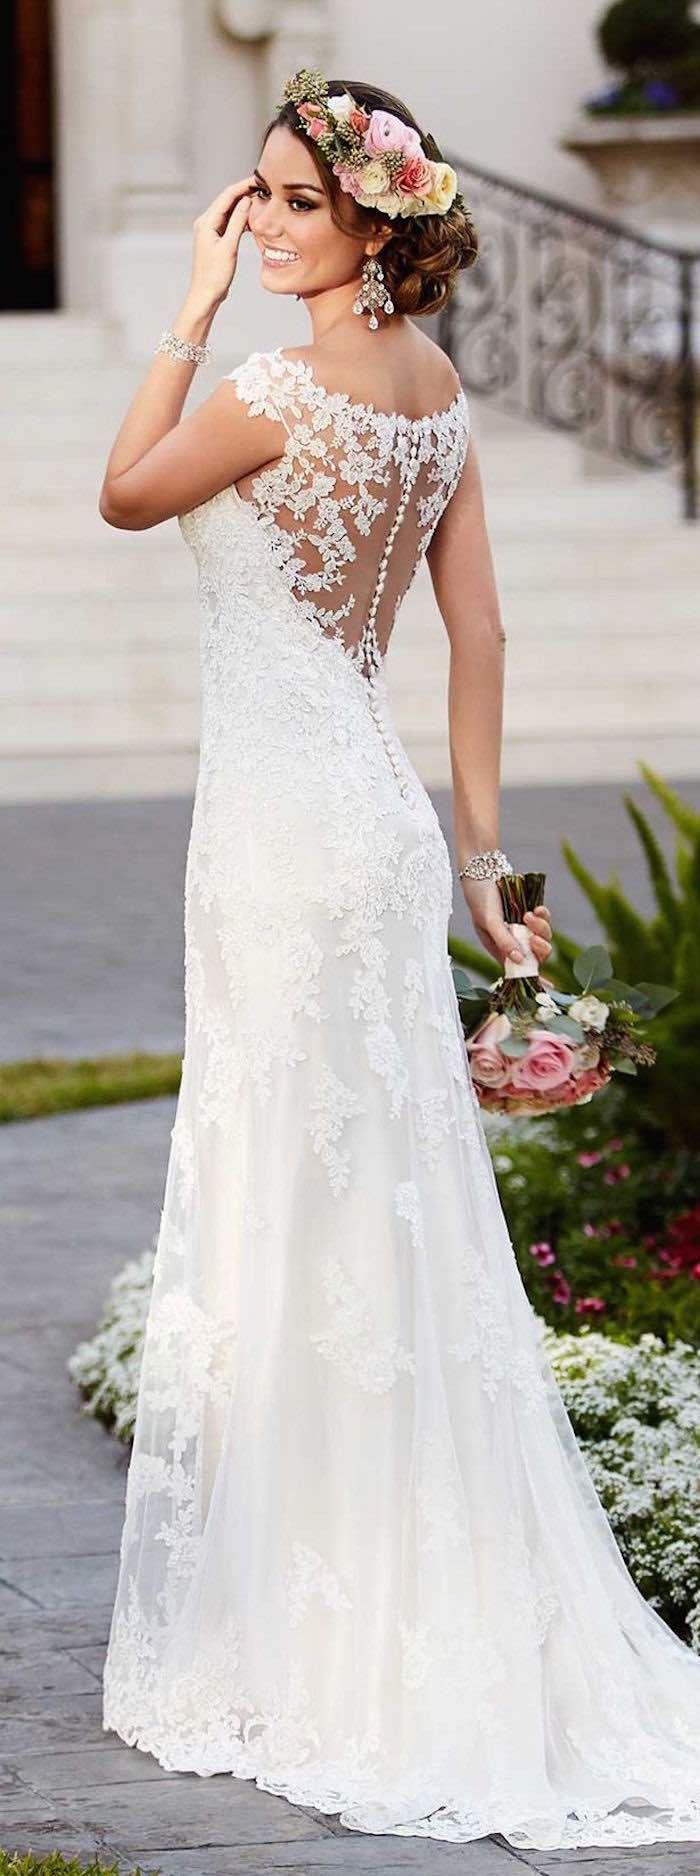 stella york wedding gowns Stella York lace wedding dress